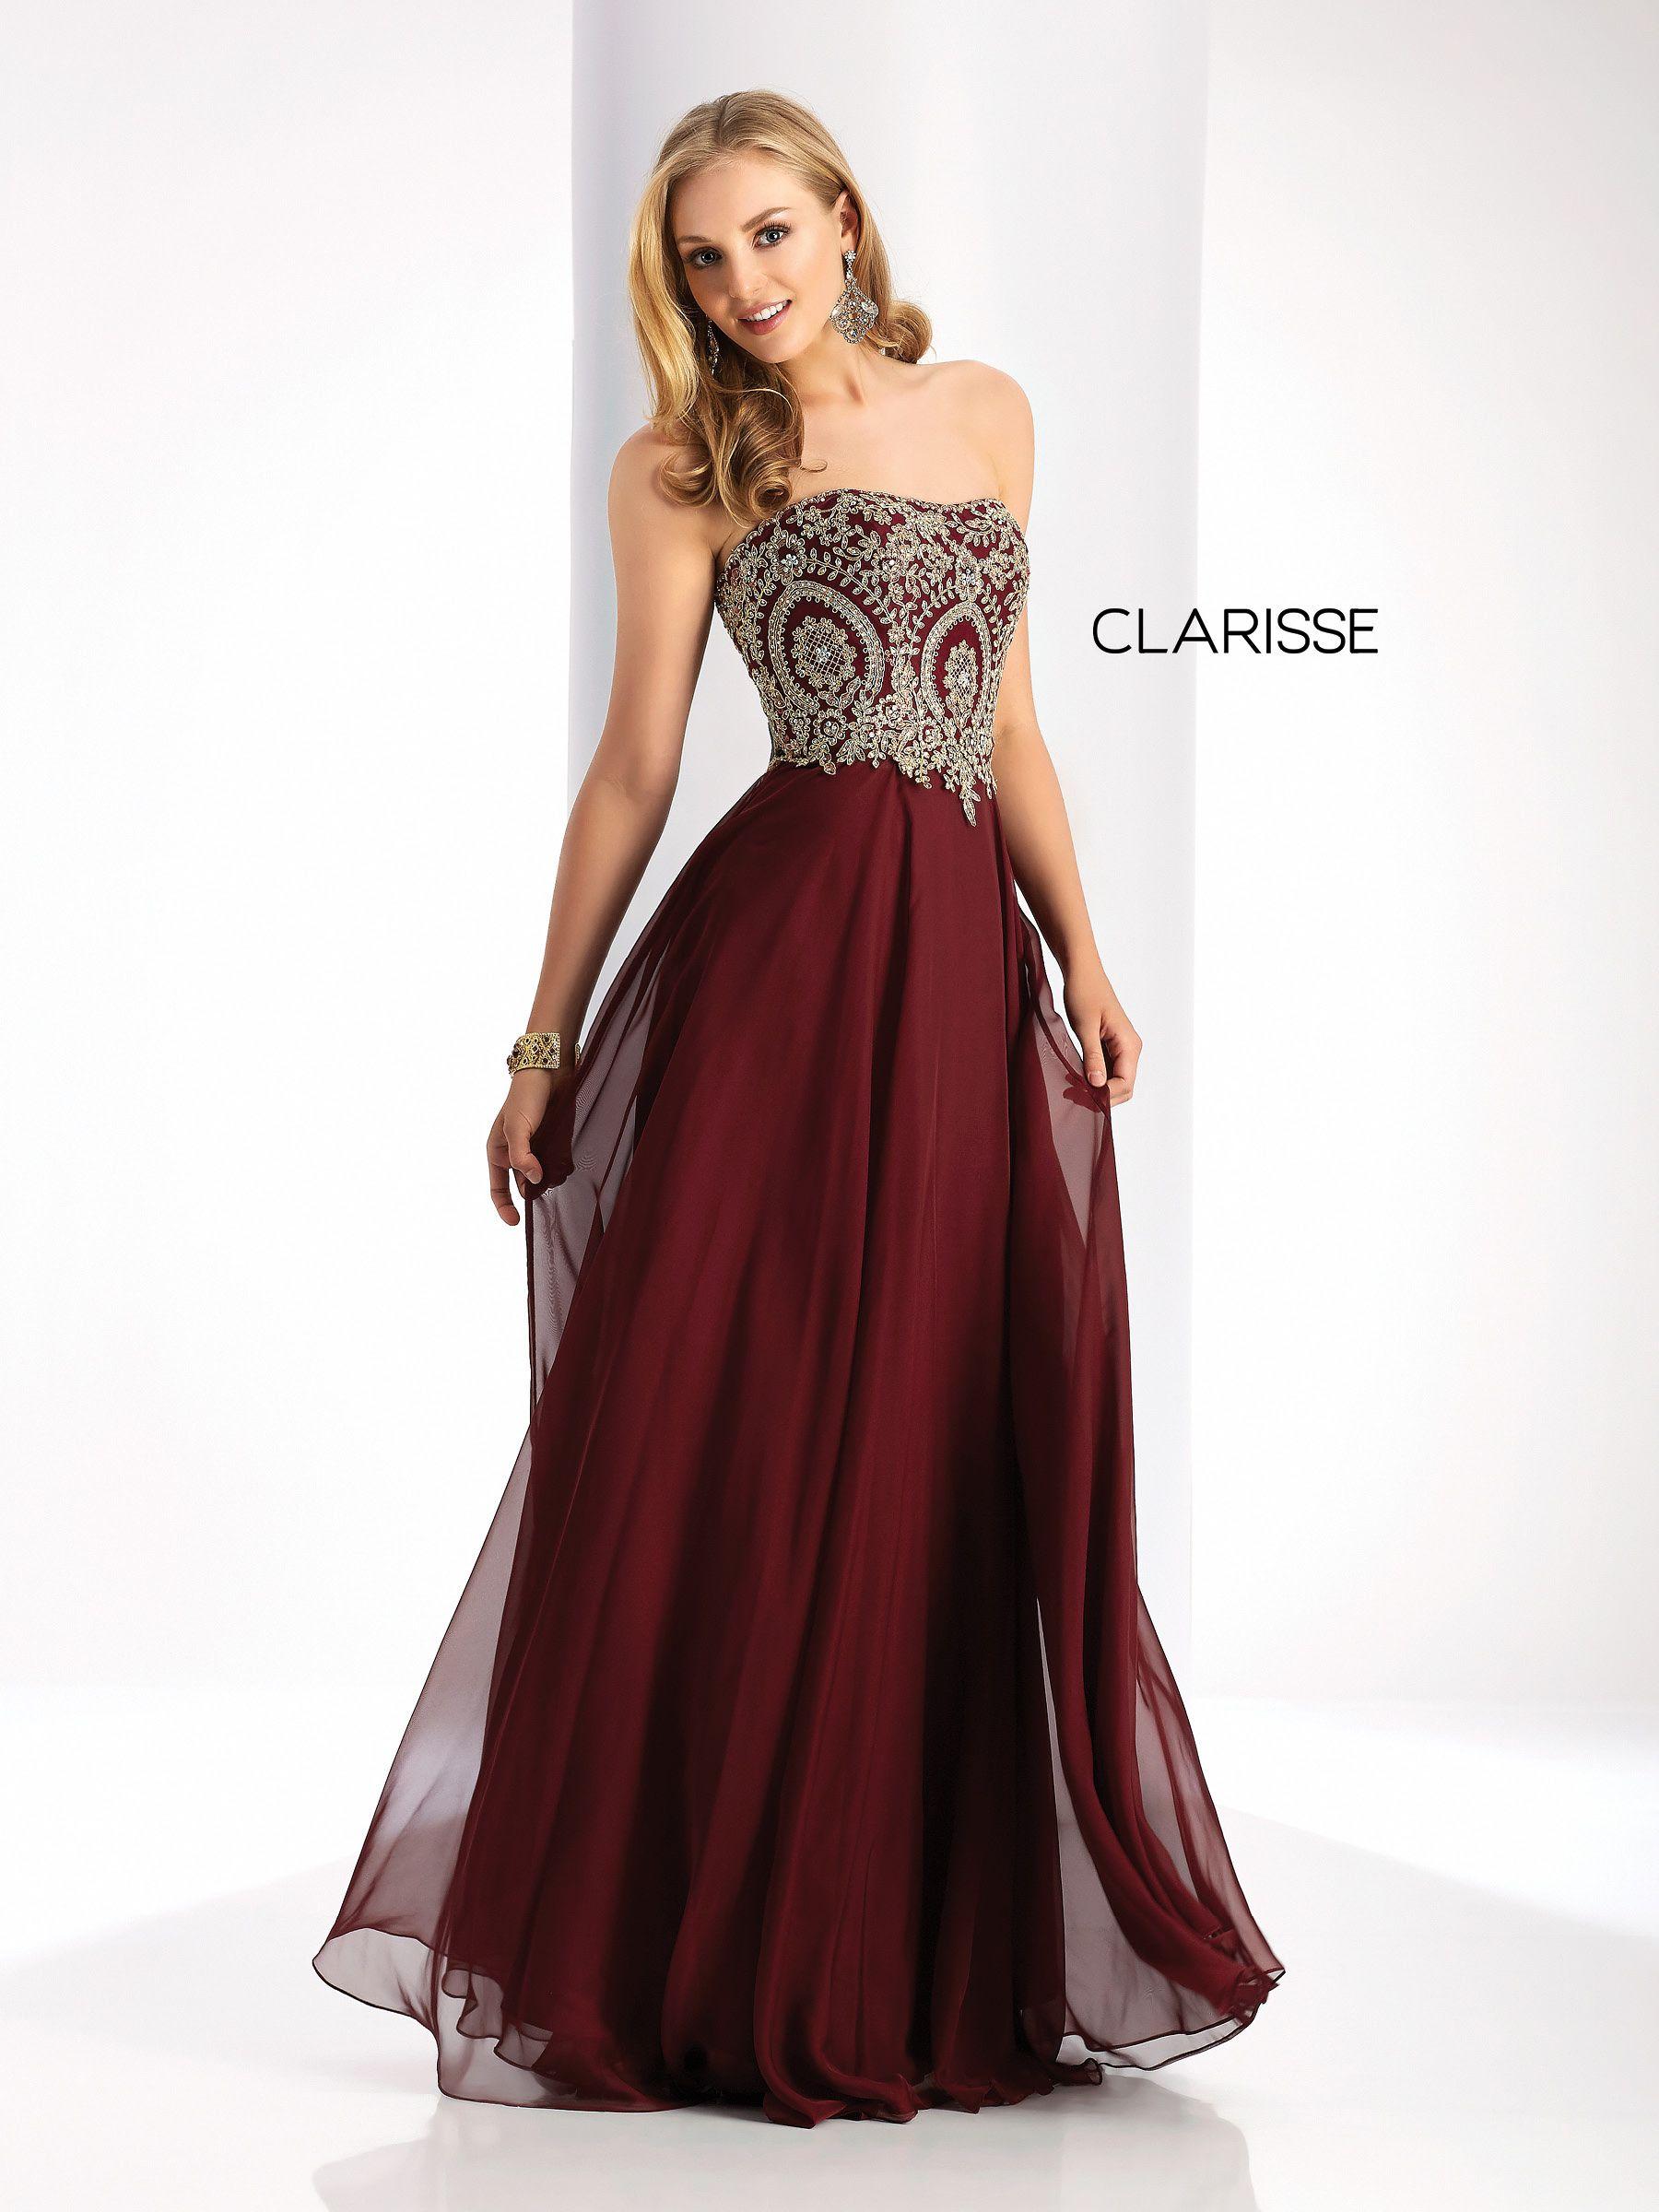 3000 - Marsala chiffon prom dress with a beaded top and corset back ... 7ec7eff6b3f1